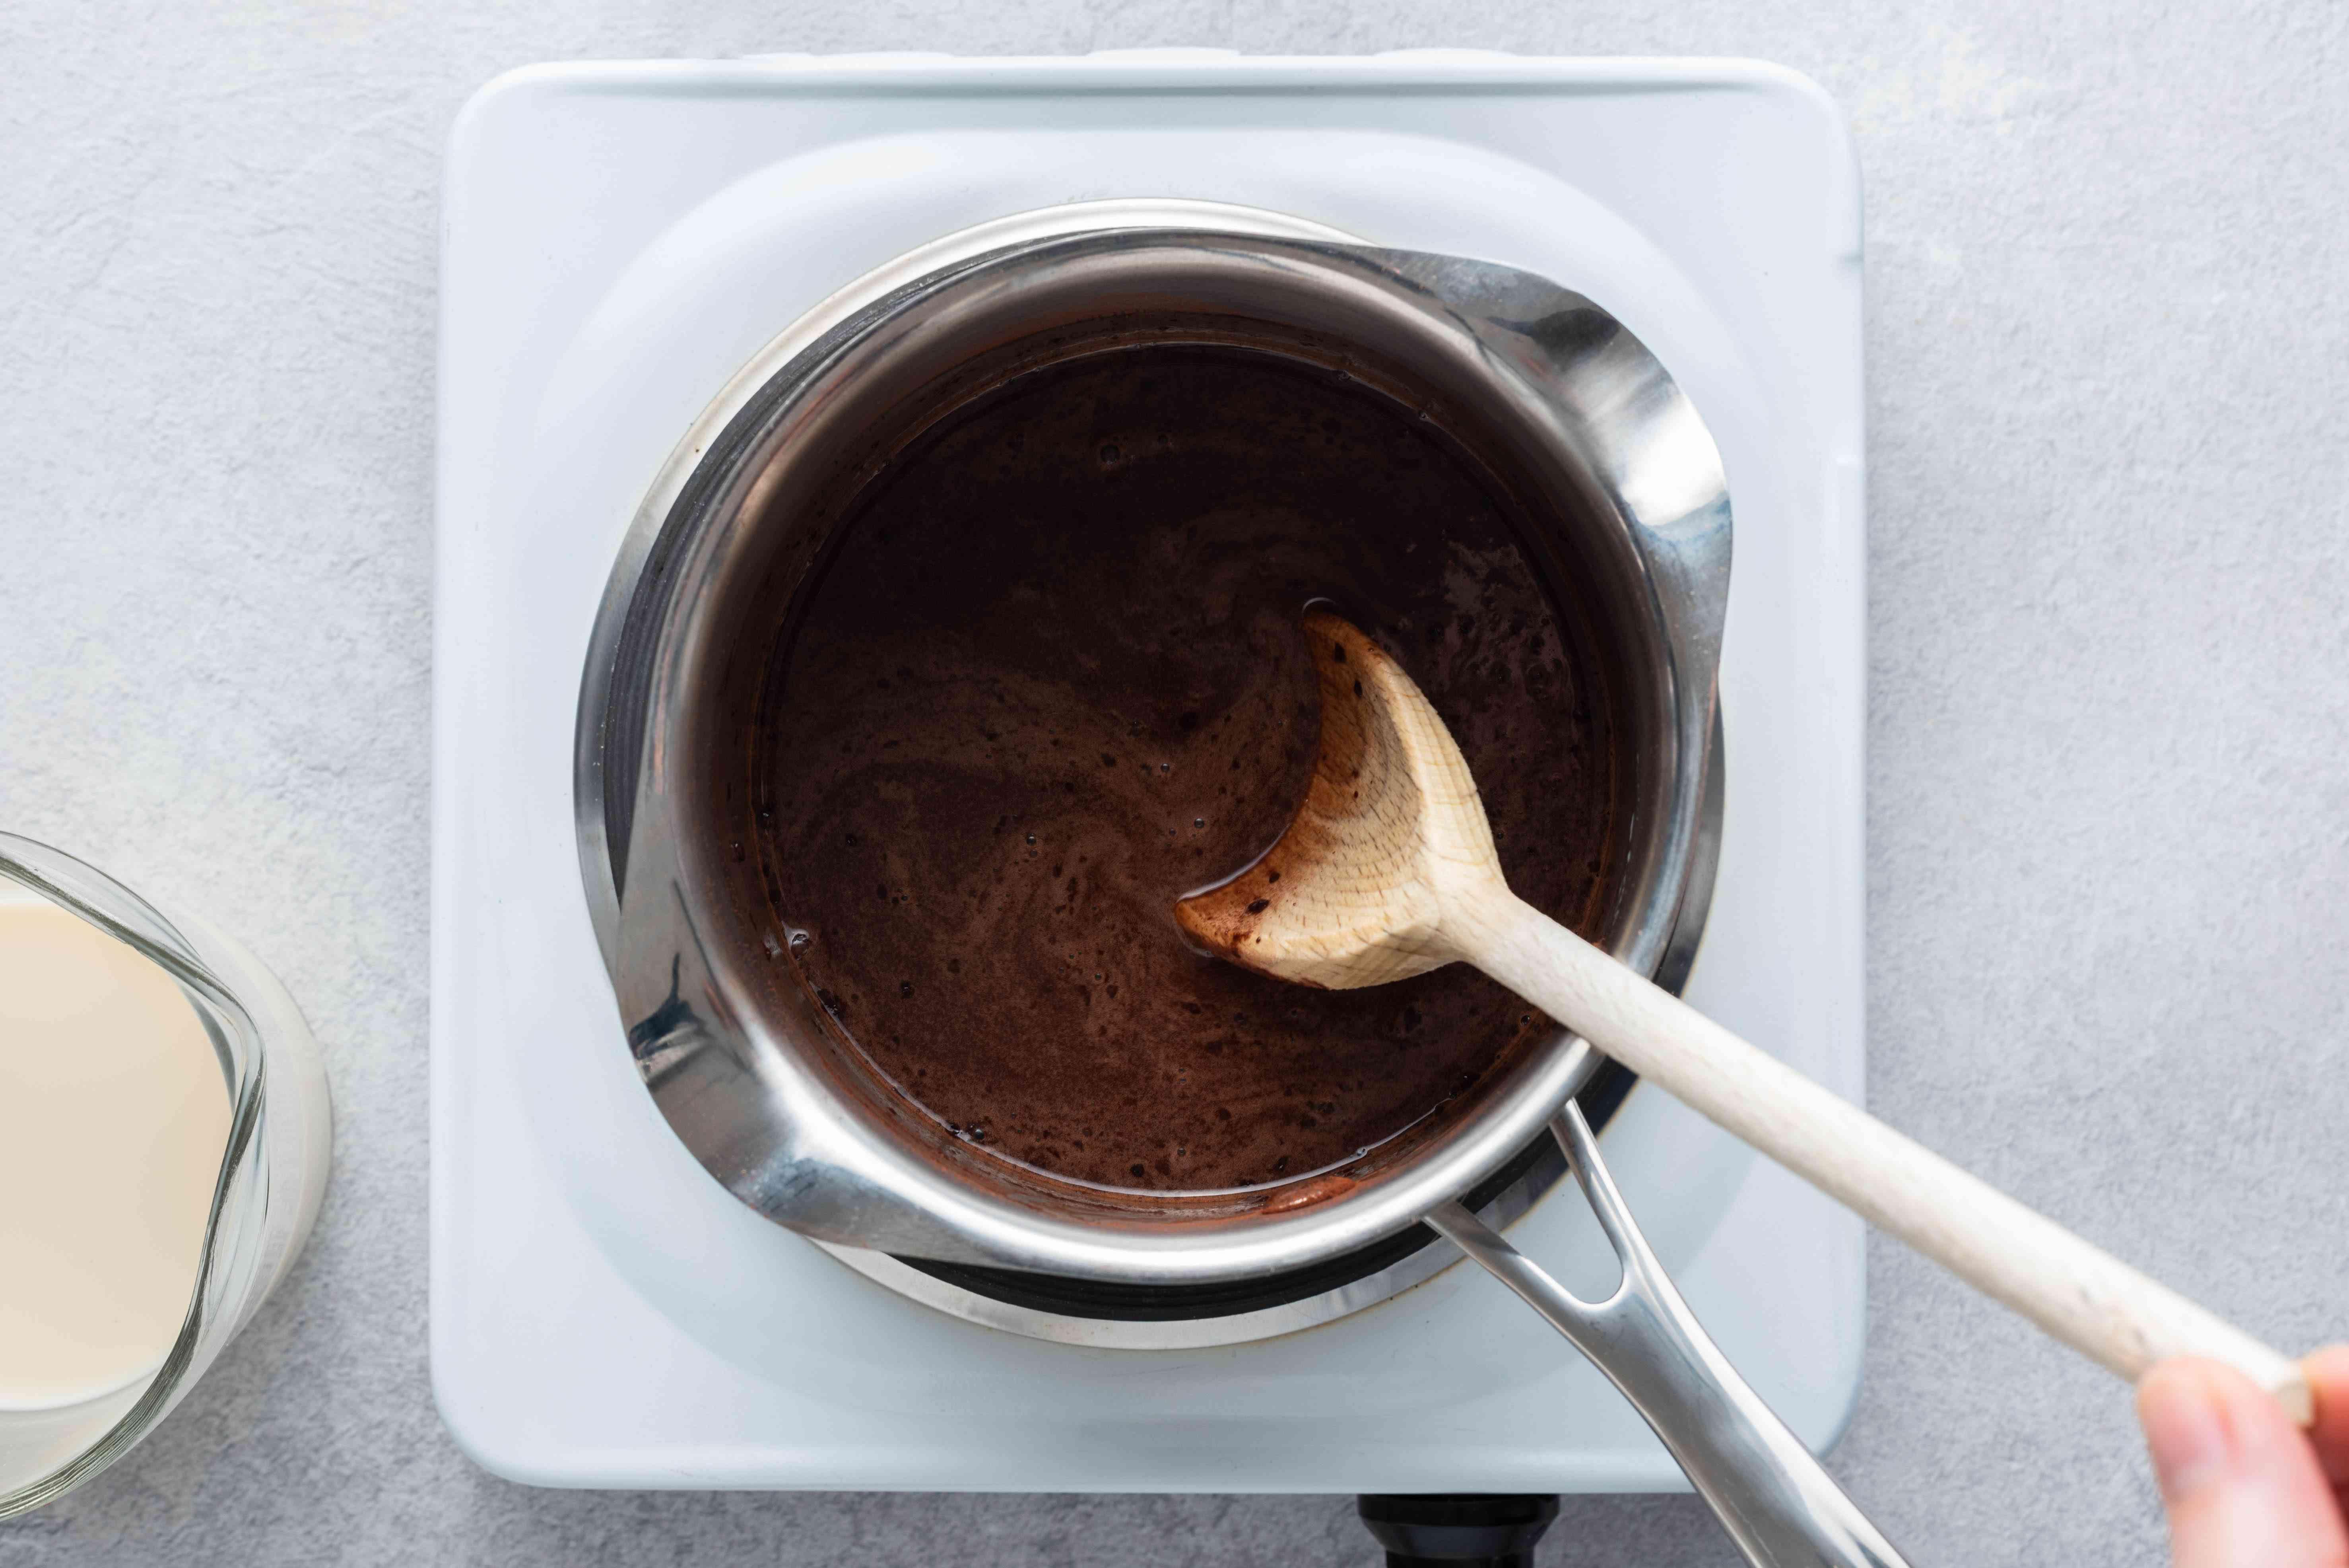 add almond milk to the cocoa powder mixture in the saucepan